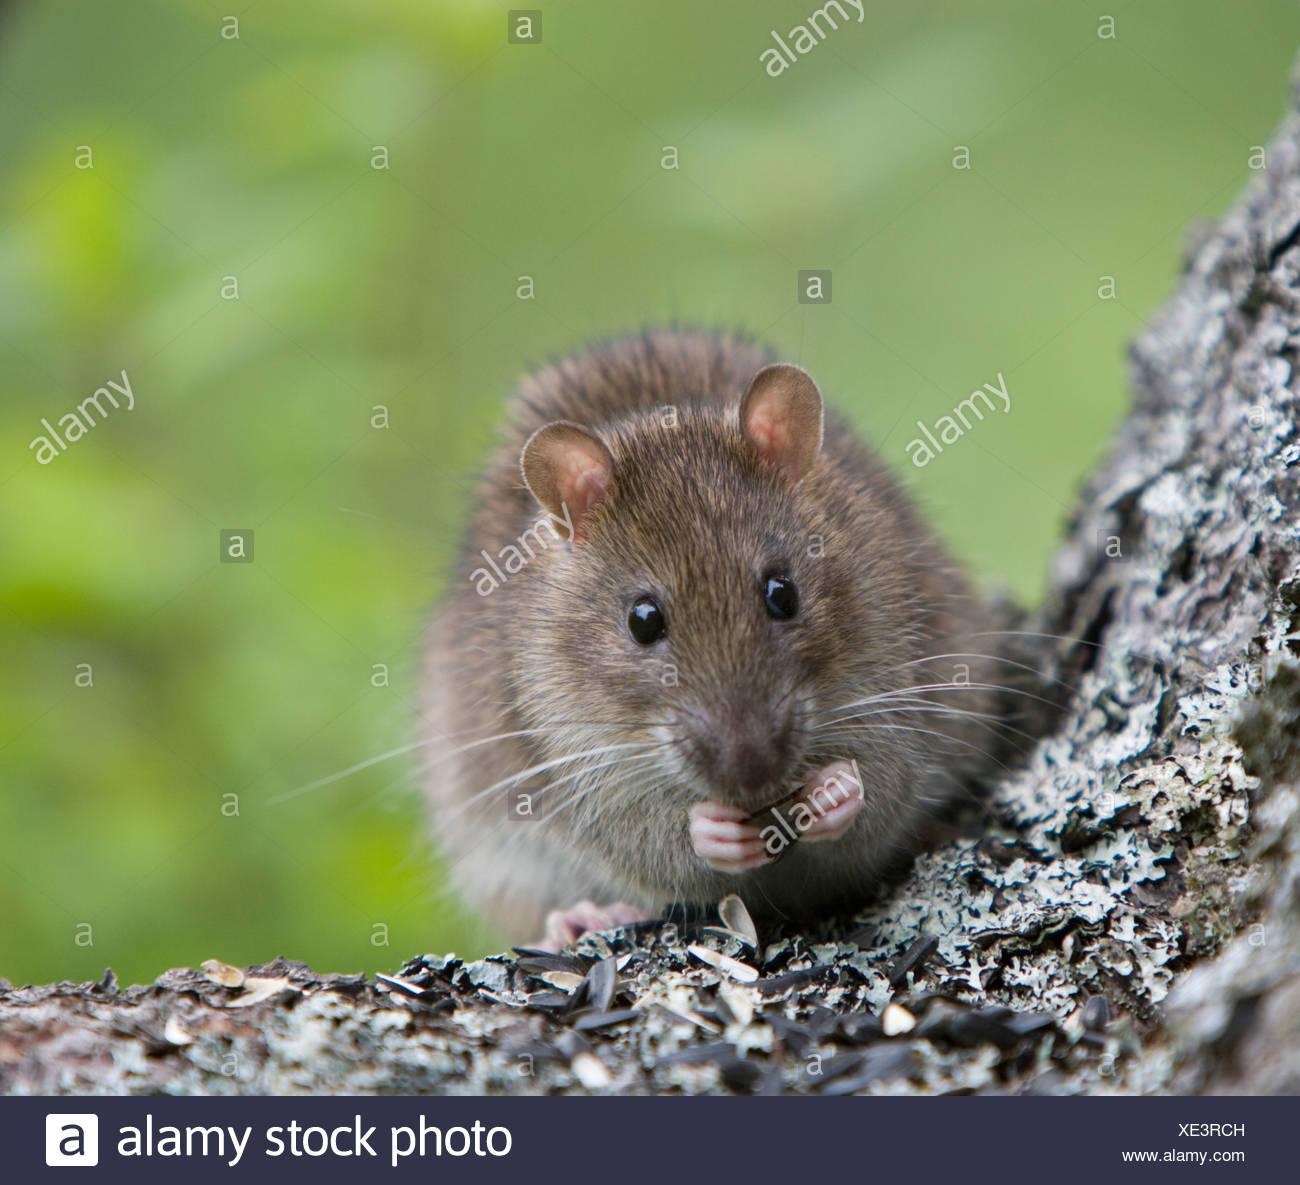 Norway rat (Rattus norvegicus) eating seeds, Grand Manan Island, New Brunswick, Canada - Stock Image